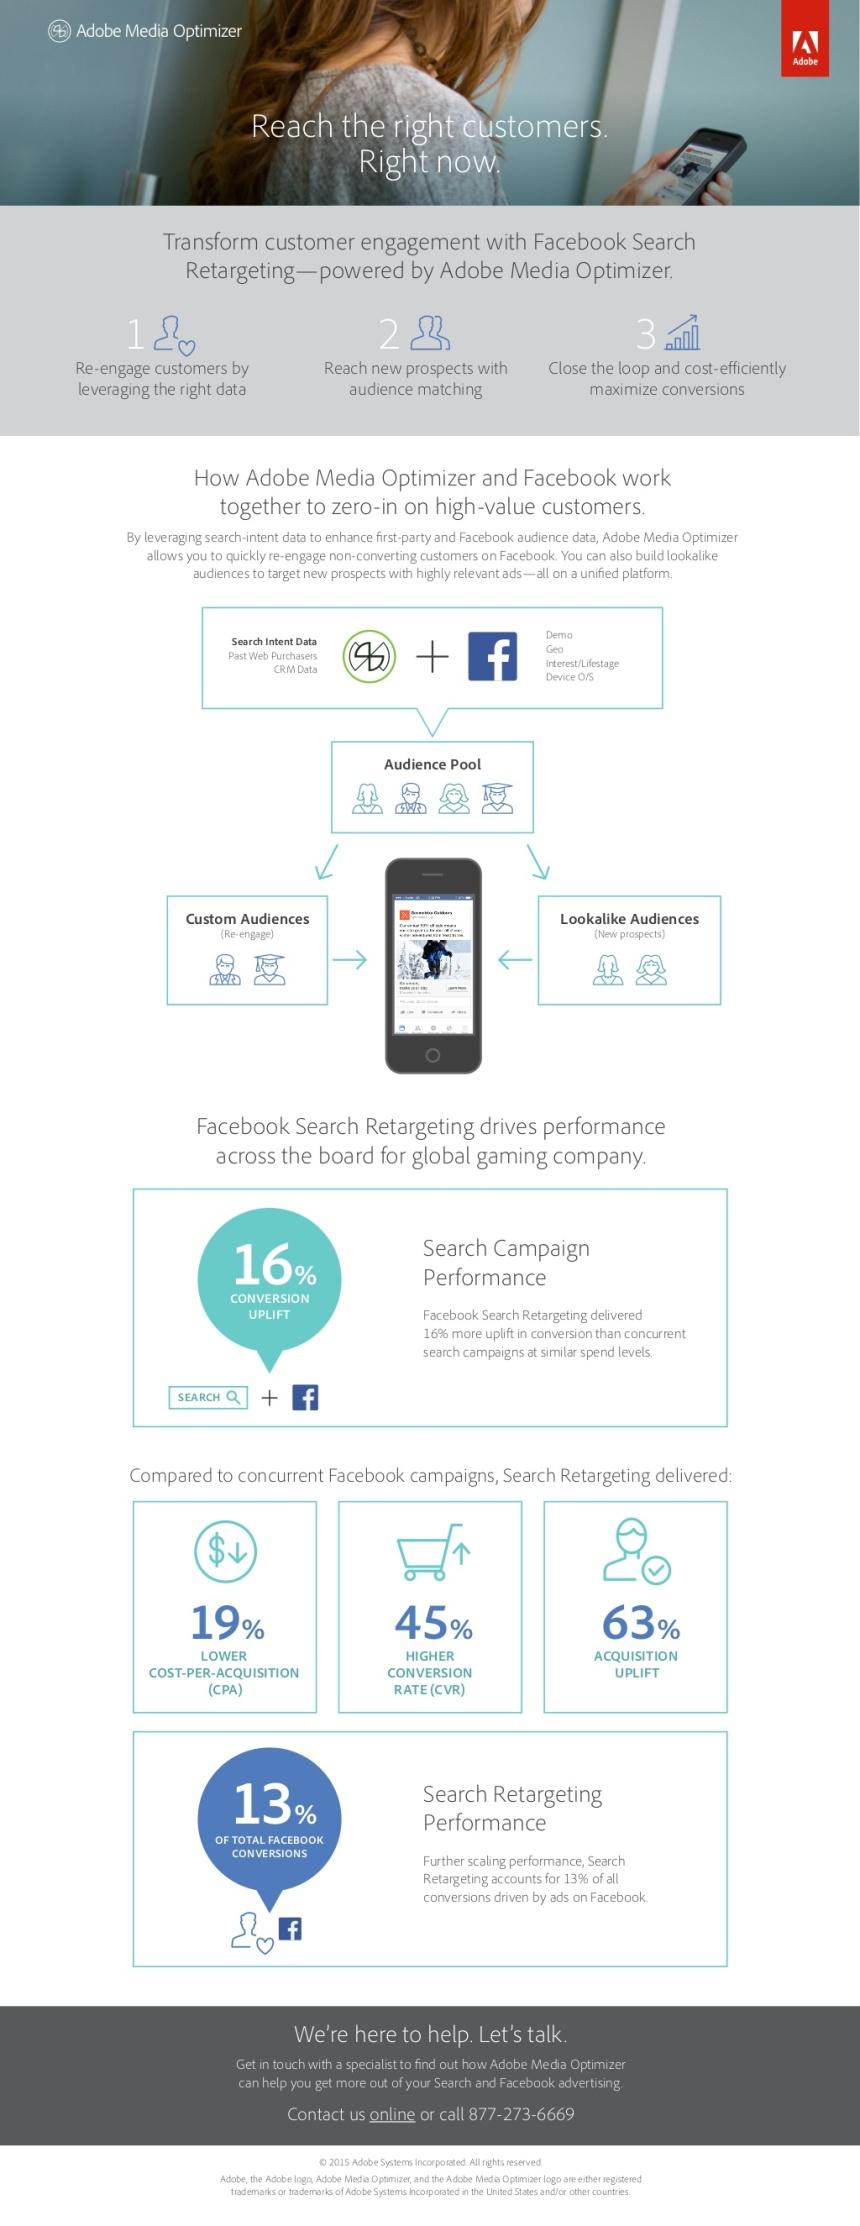 Facebook Search Retargeting & Adobe Media Optimizer